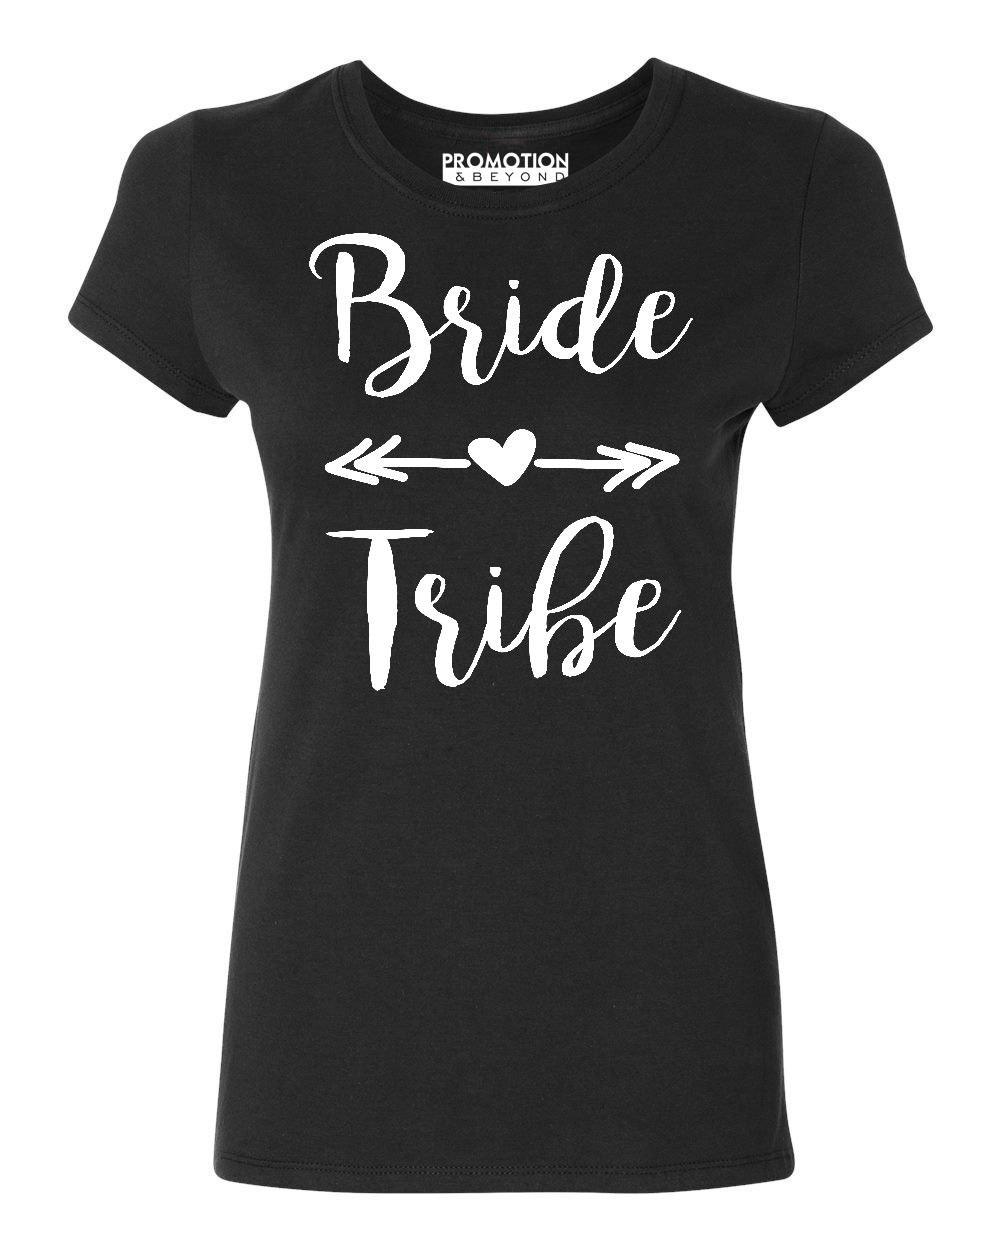 Wedding Bridal Party Gear Bride Tribe Women's T-Shirt, M, Black